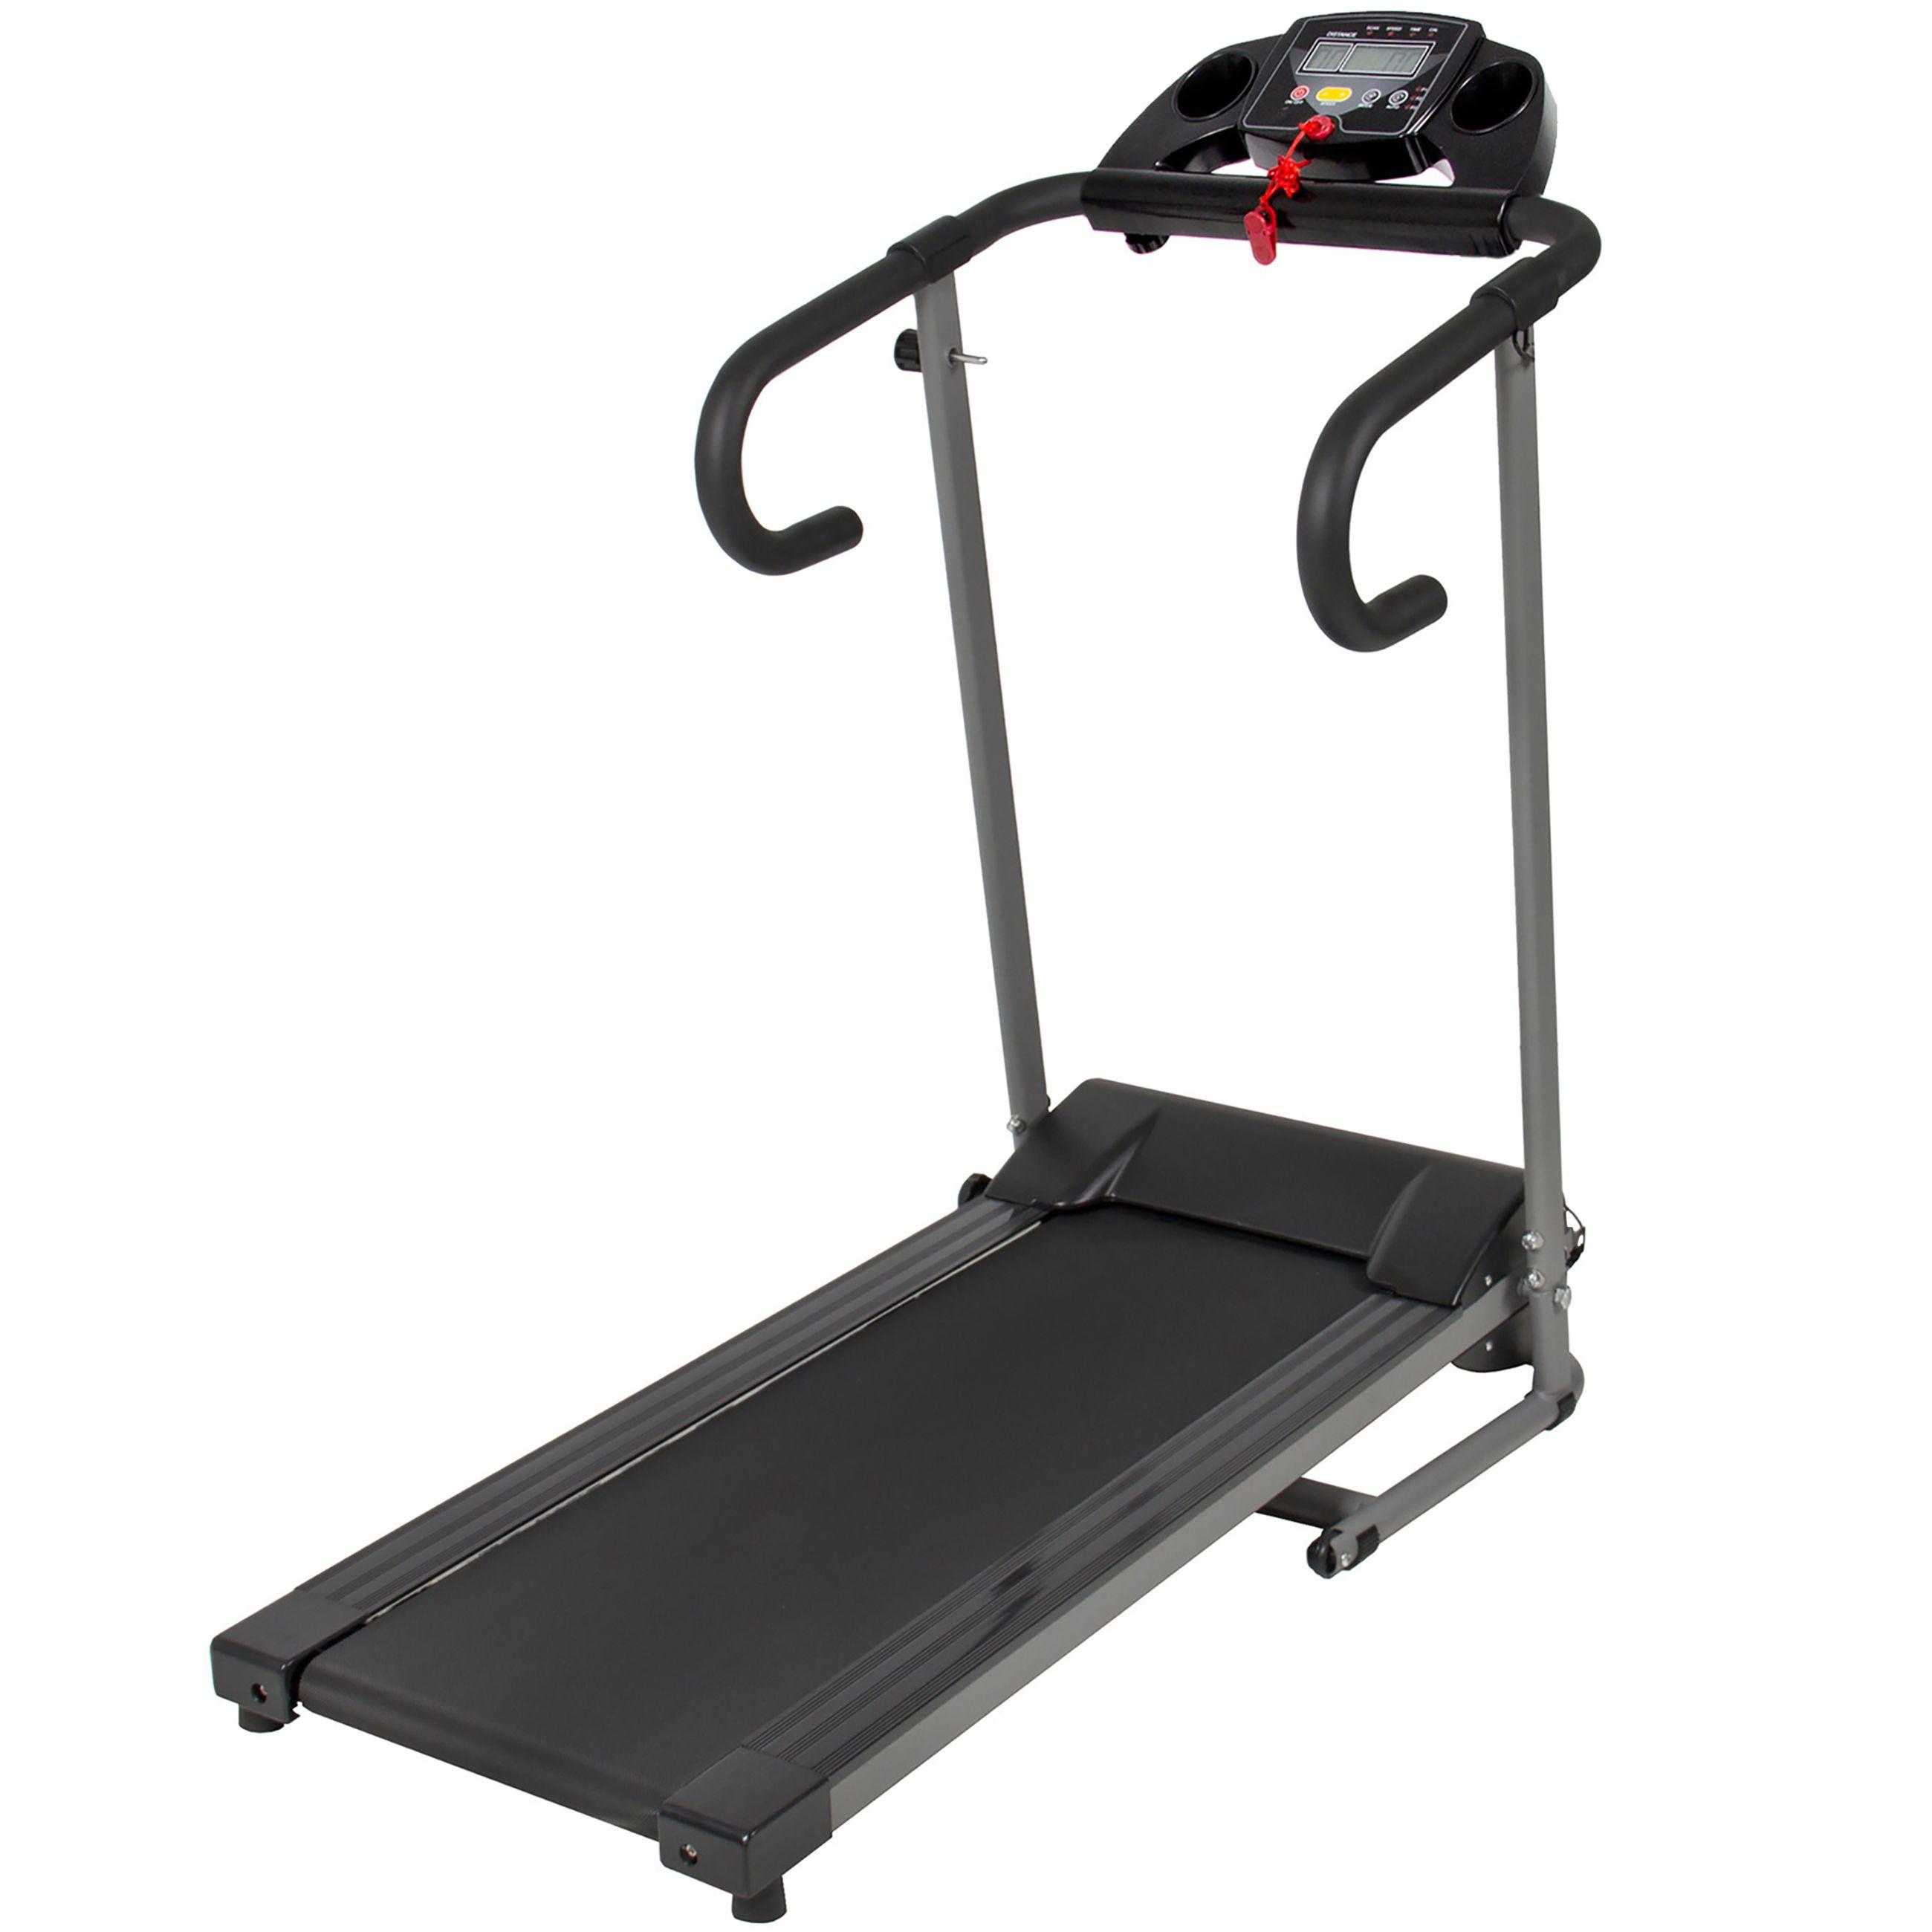 1100w Folding Electric Treadmill Portable Motorized Running Fitness Machine Bk Deal